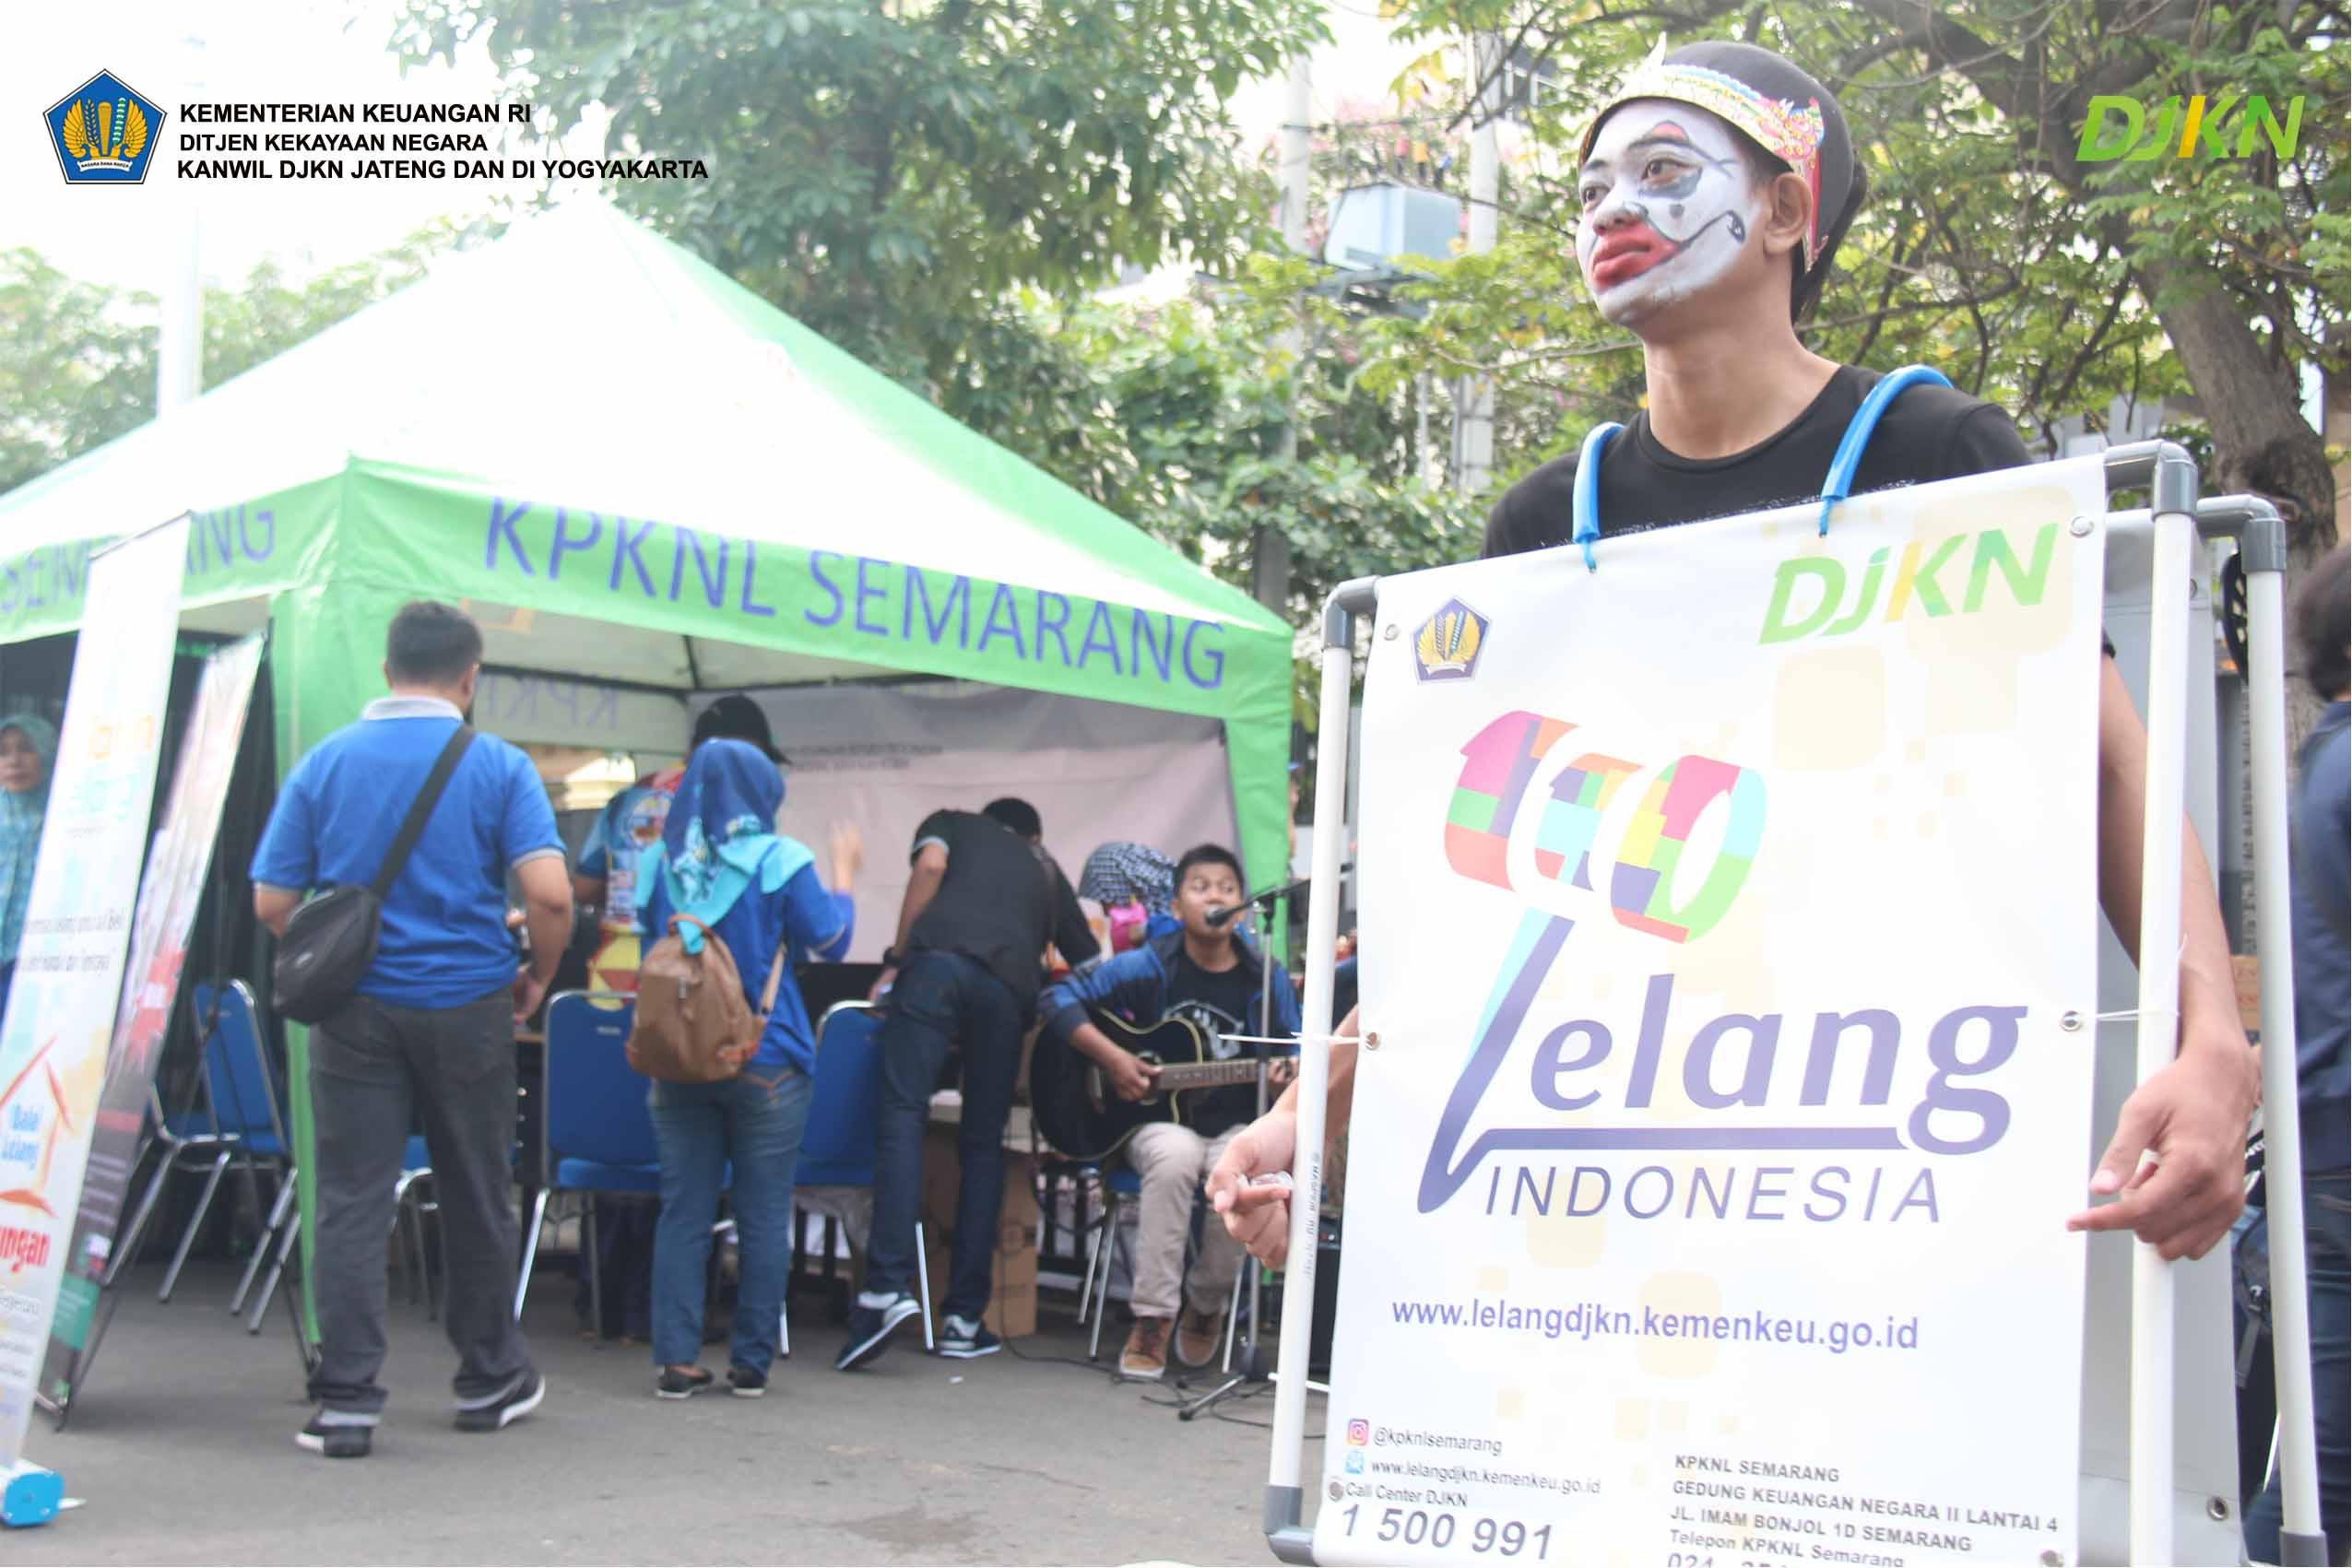 Gebyar 110 Tahun Lelang Indonesia di Car Free Day Semarang